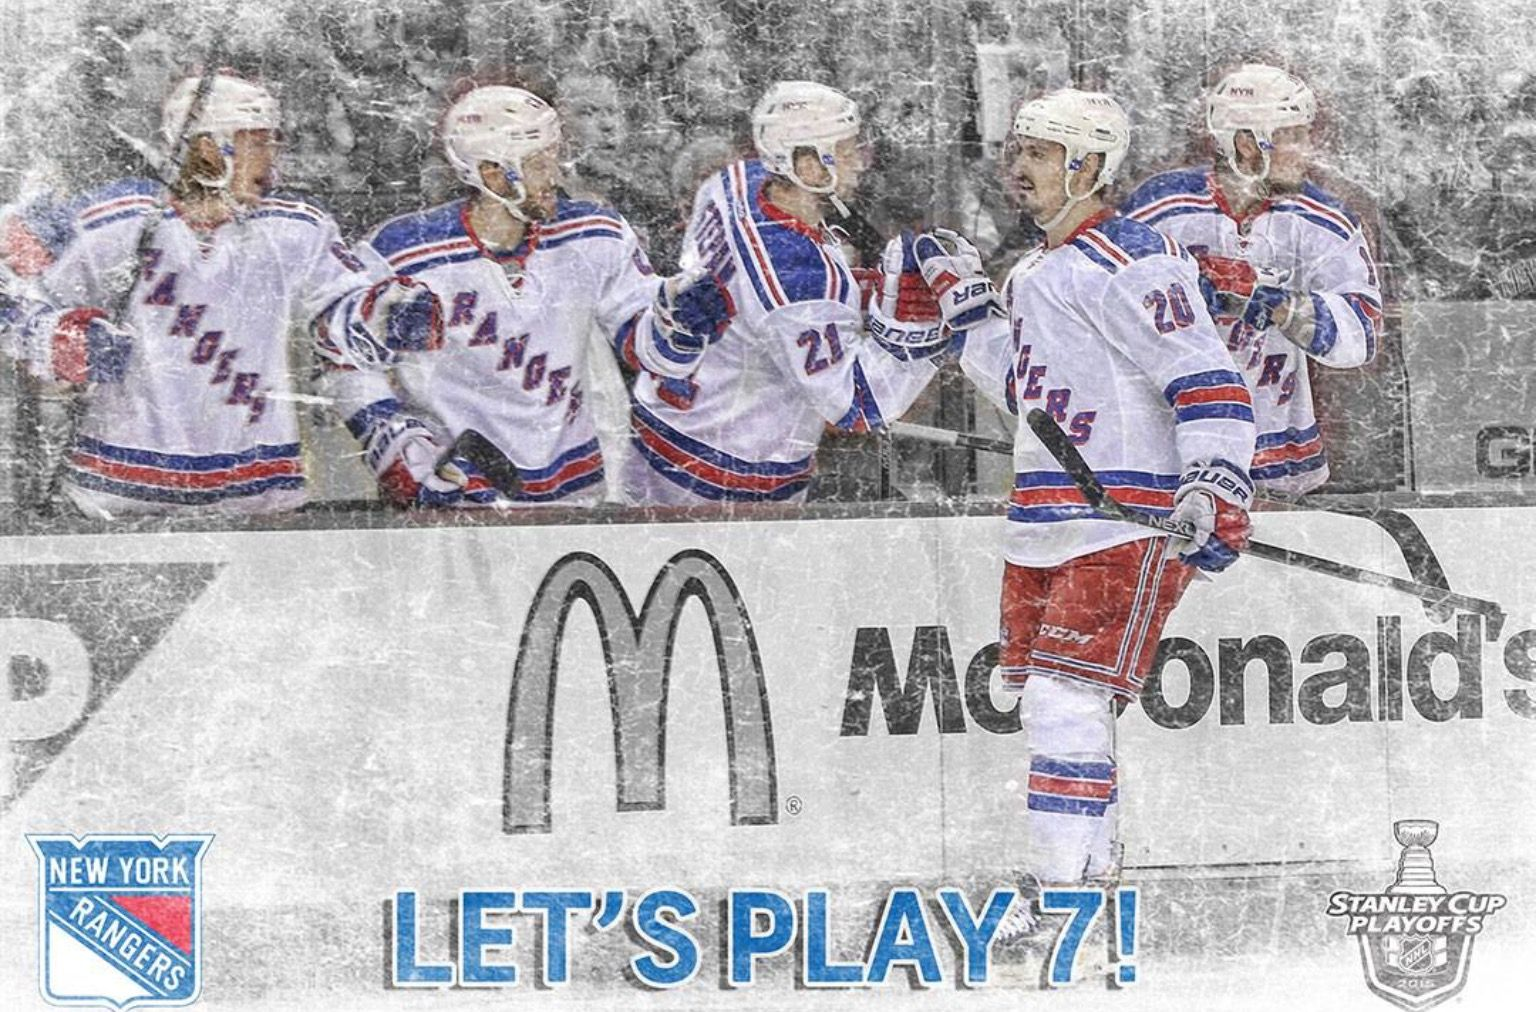 Pin by Gilbert Ice Jr on My favorite Hockey team New York